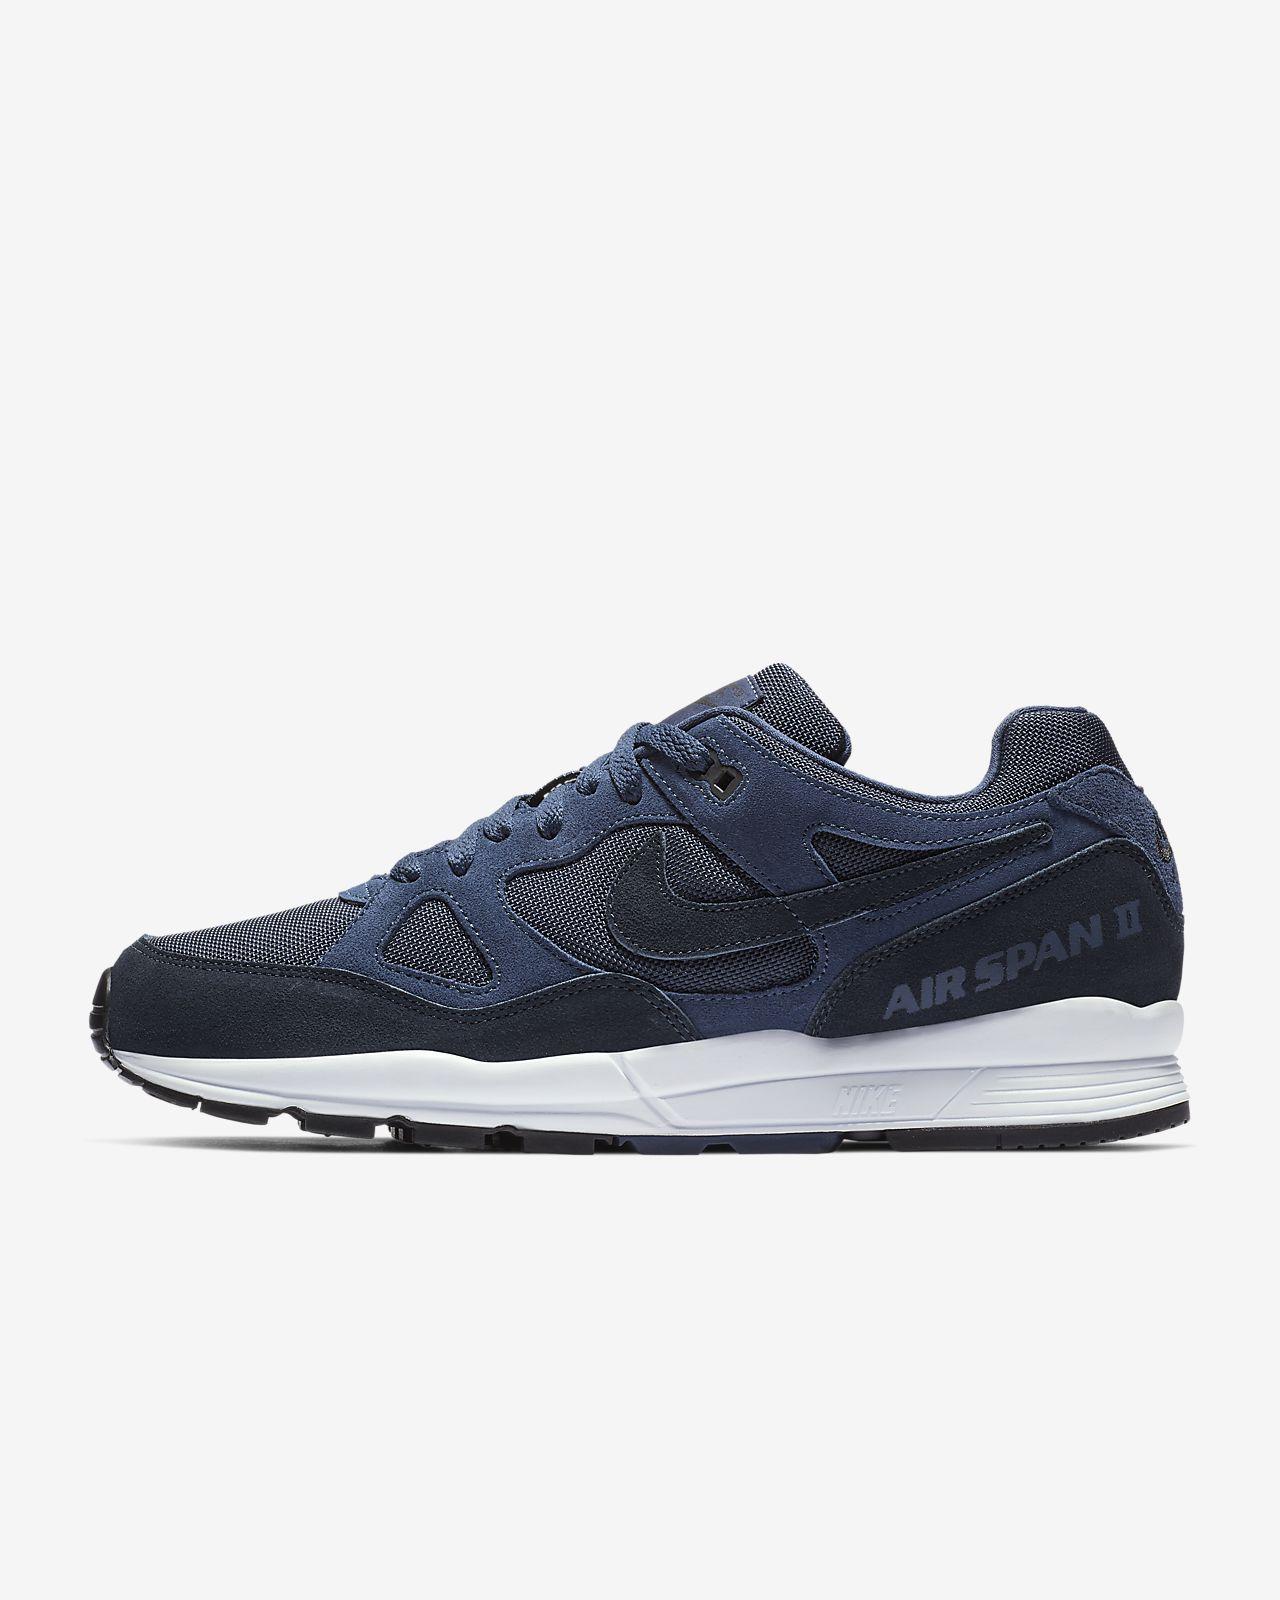 ec51513acfb Nike Air Span II SE Men s Shoe. Nike.com IE